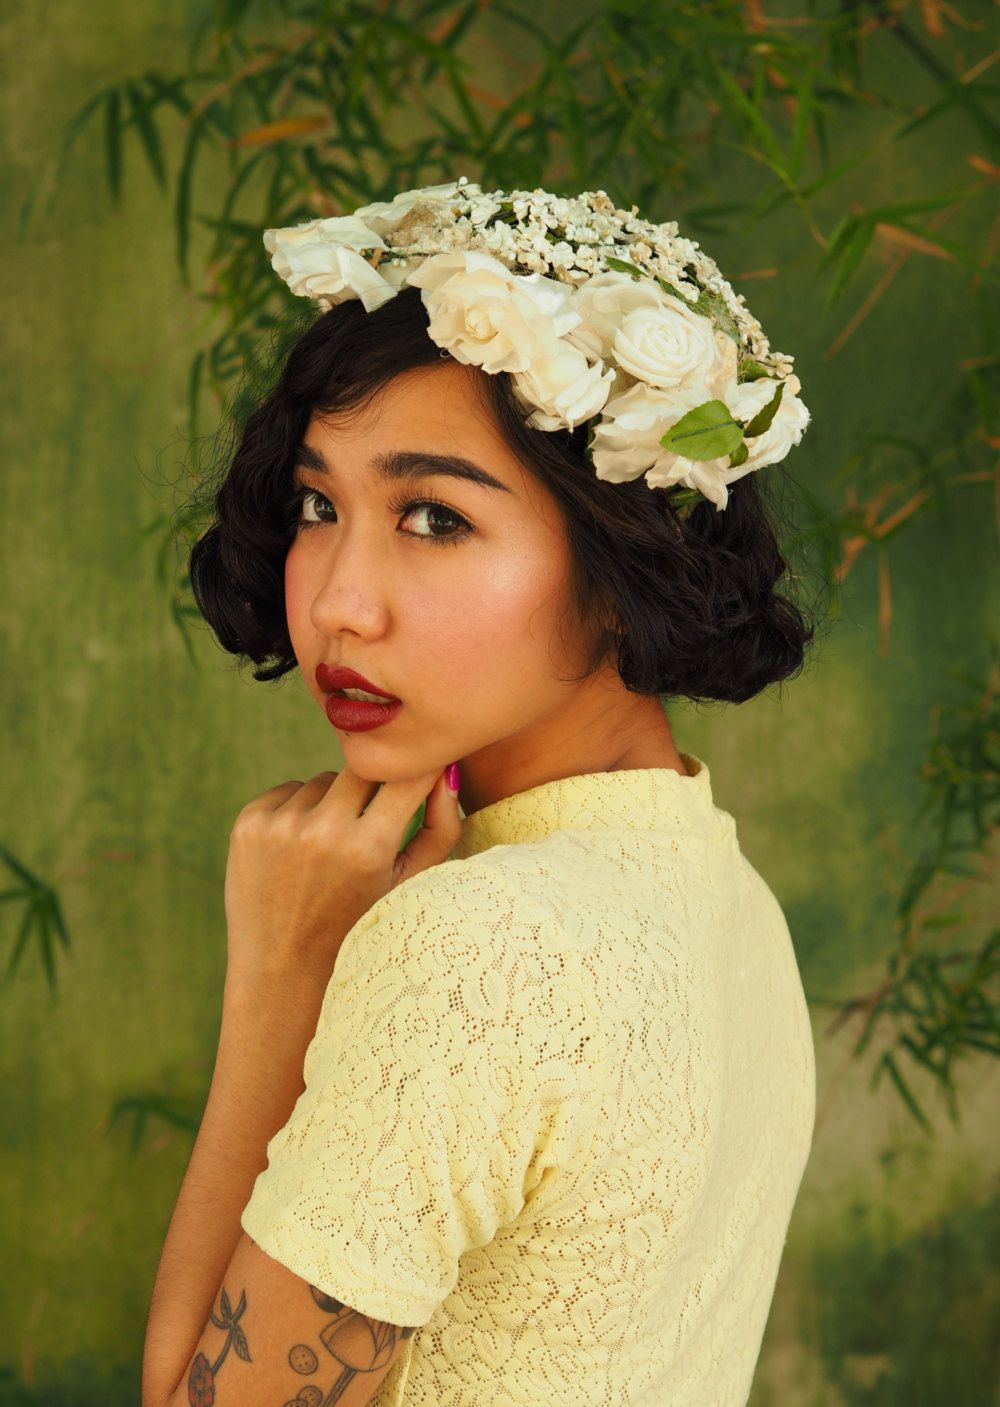 Vintage Hat Vintage Womens Hat 1960s Silk Floral Hat Etsy Hats Vintage Vintage Millinery Floral Hat